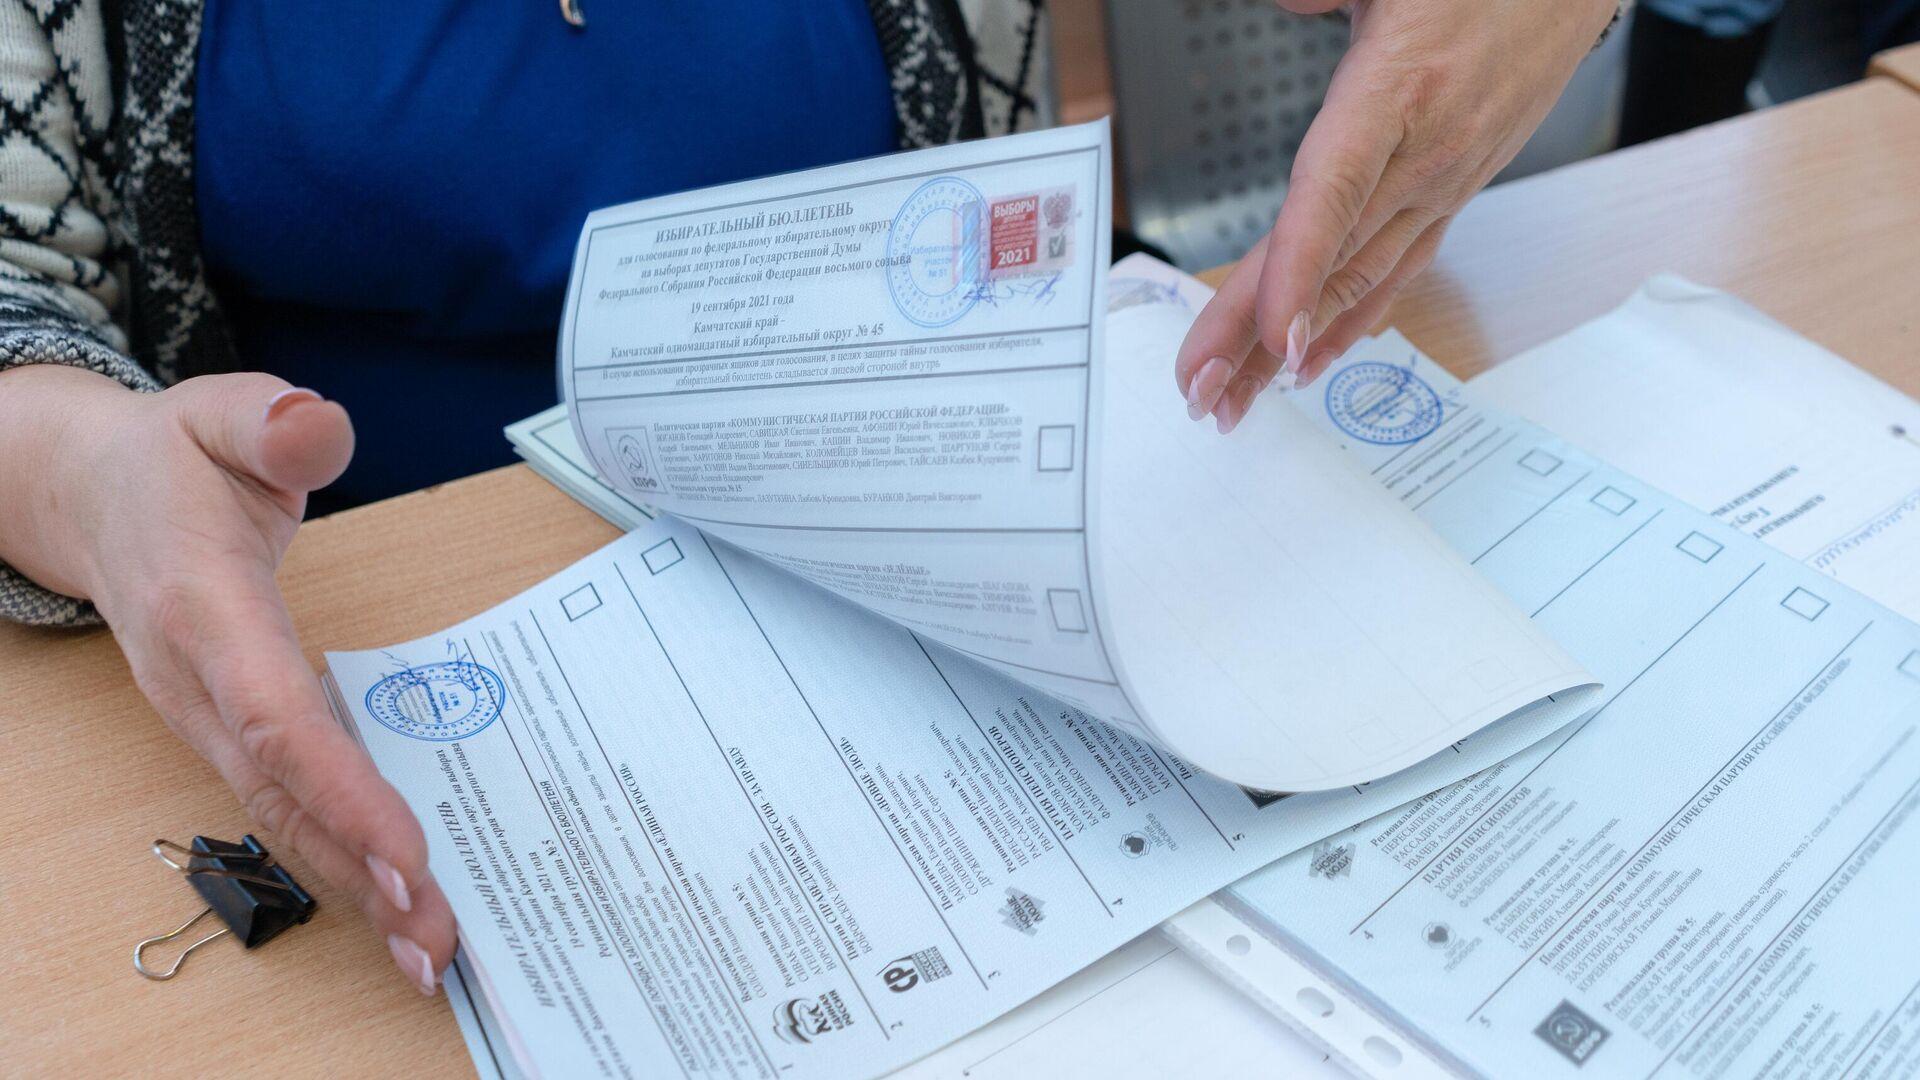 1750654679 0:167:3050:1883 1920x0 80 0 0 f583f2260f0ee3409d43b42419099bb0 - В Кабардино-Балкарии явка на выборах в Госдуму превысила 50 процентов к 16:00